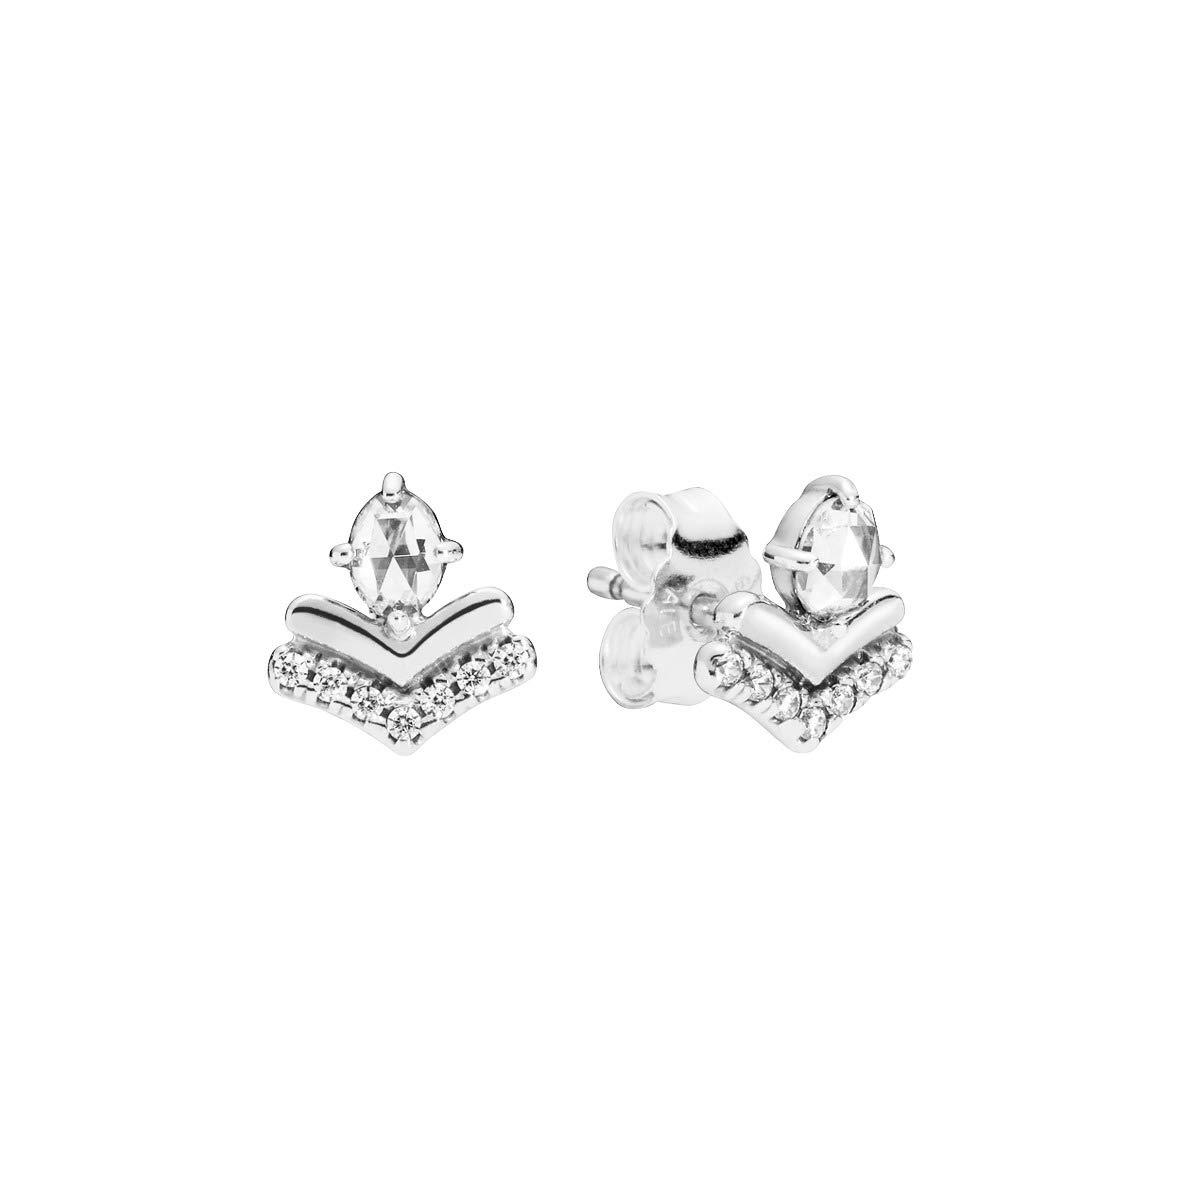 cad4654c5d980 Amazon.com: Pandora Classic Wish Silver One Size Earring 297787CZ ...